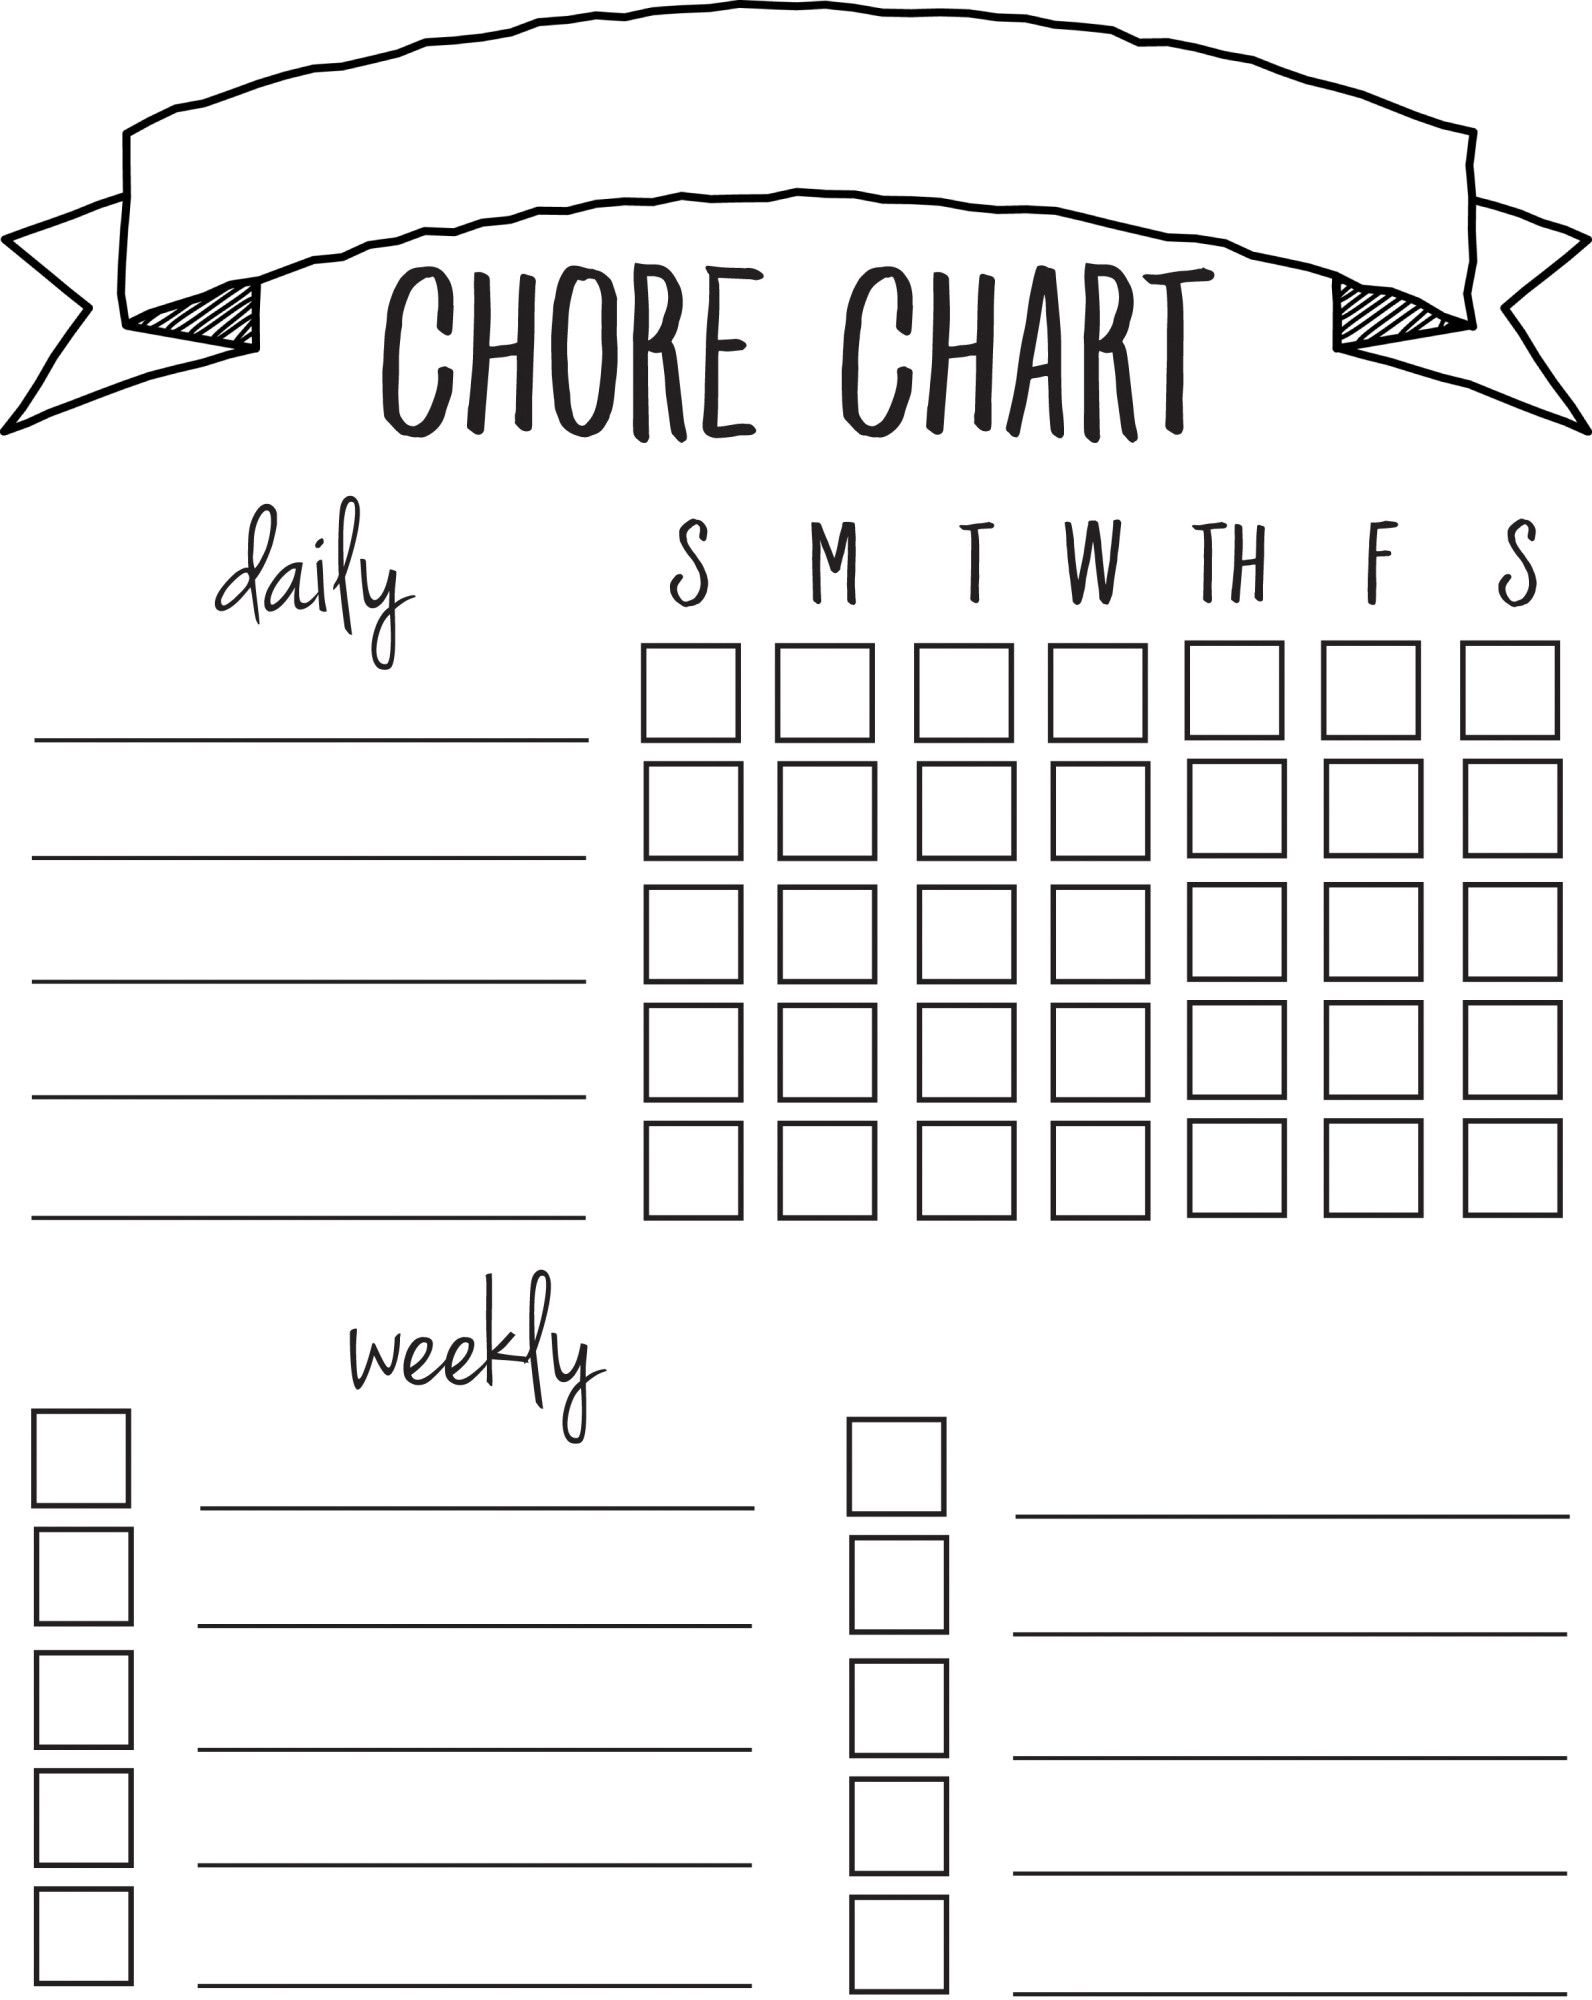 Diy Printable Chore Chart   Free Printables Nov/feb   Pinterest - Free Printable Charts And Lists